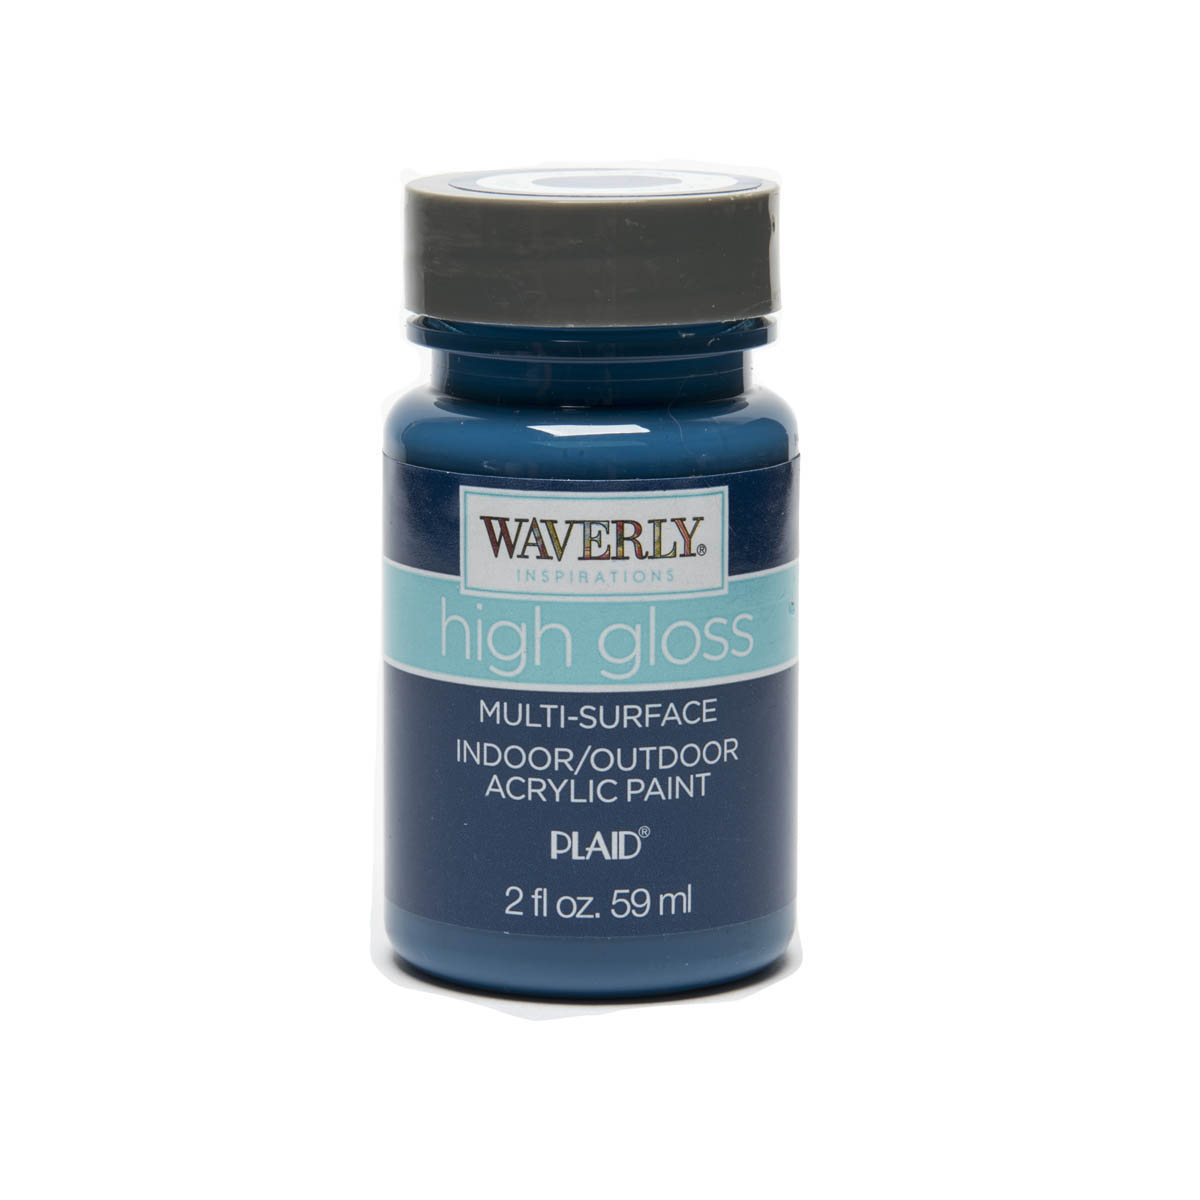 Waverly ® Inspirations High Gloss Multi-Surface Acrylic Paint - Ocean, 2 oz. - 60943E